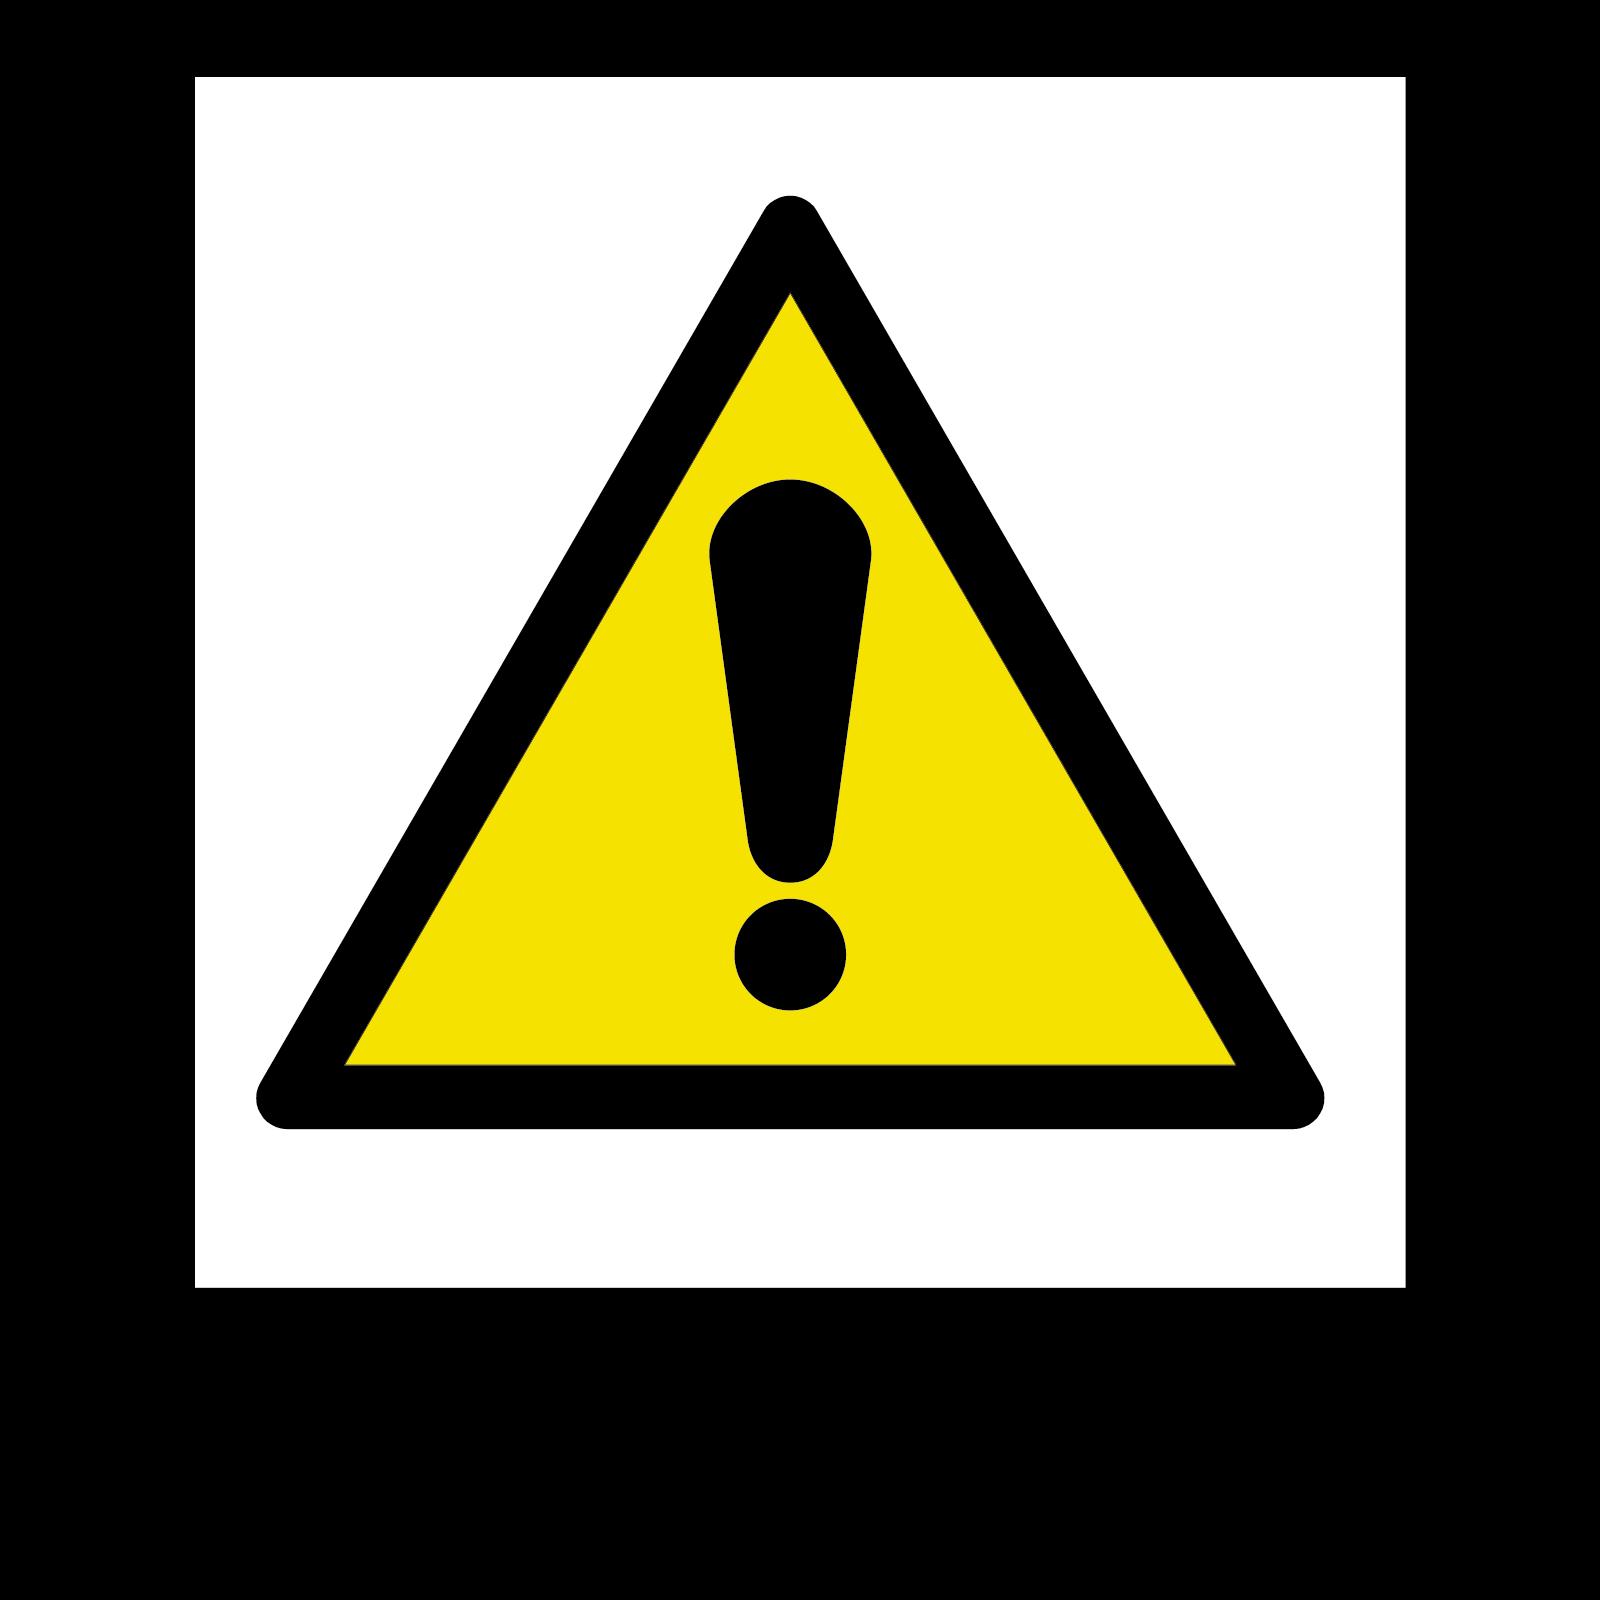 Warning Safety Symbol Sign